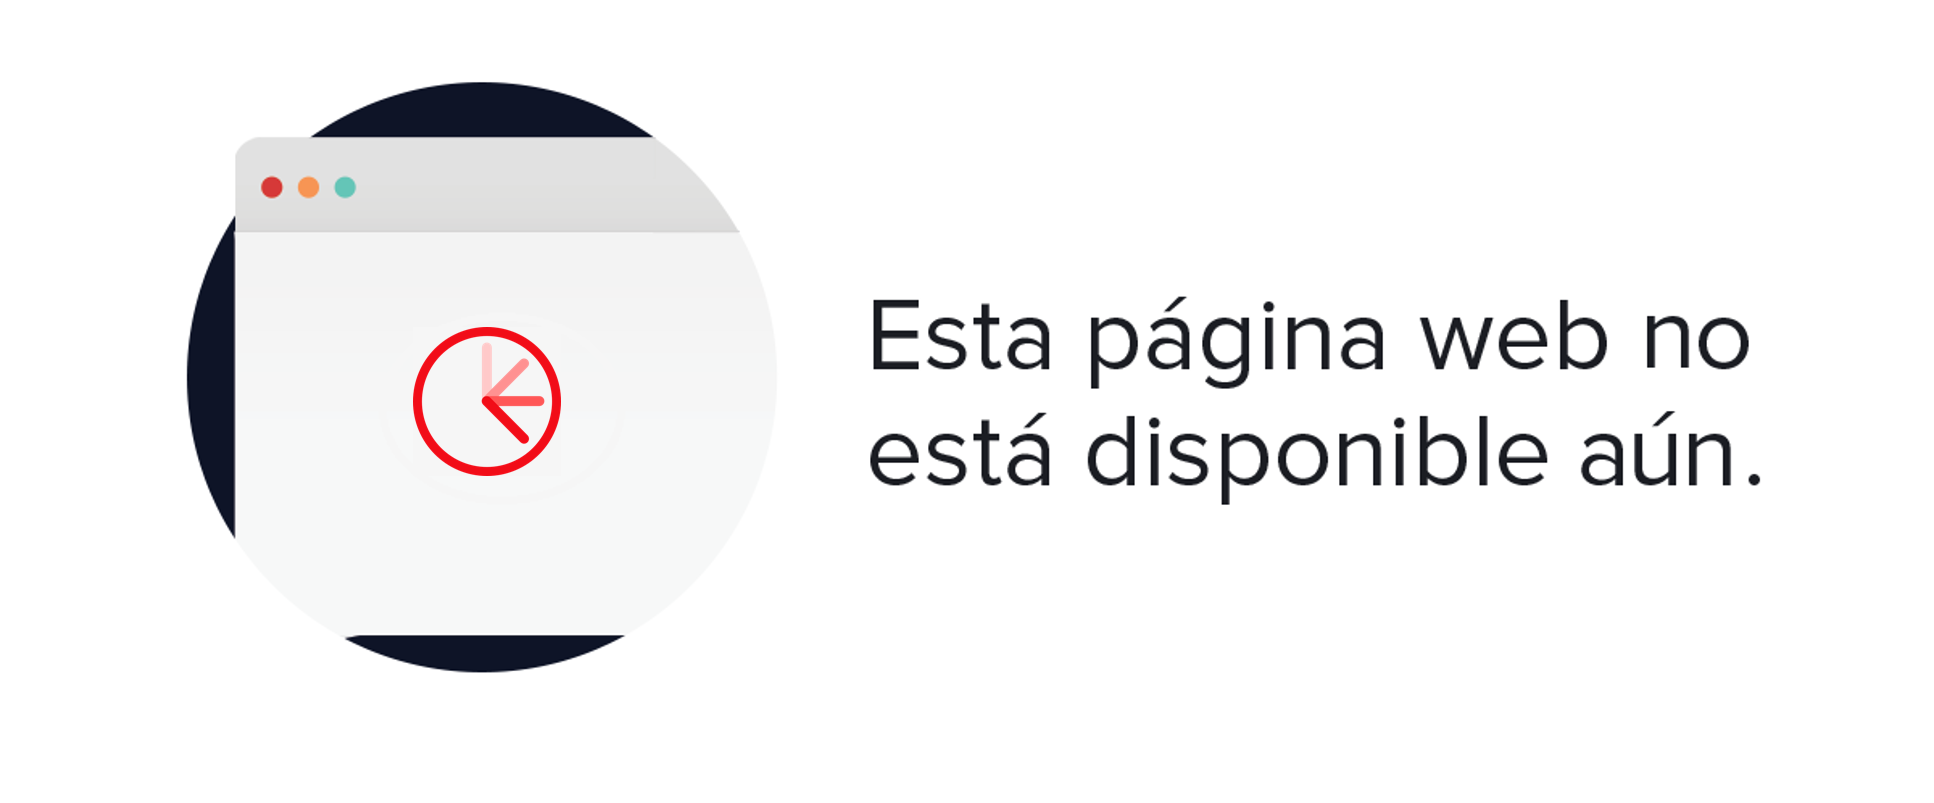 Fiesta El Corte Inglés - Chaqueta larga de mujer Fiesta El Corte Inglés de terciopelo Verde oscuro 001005612400399003 - IDDLNDH